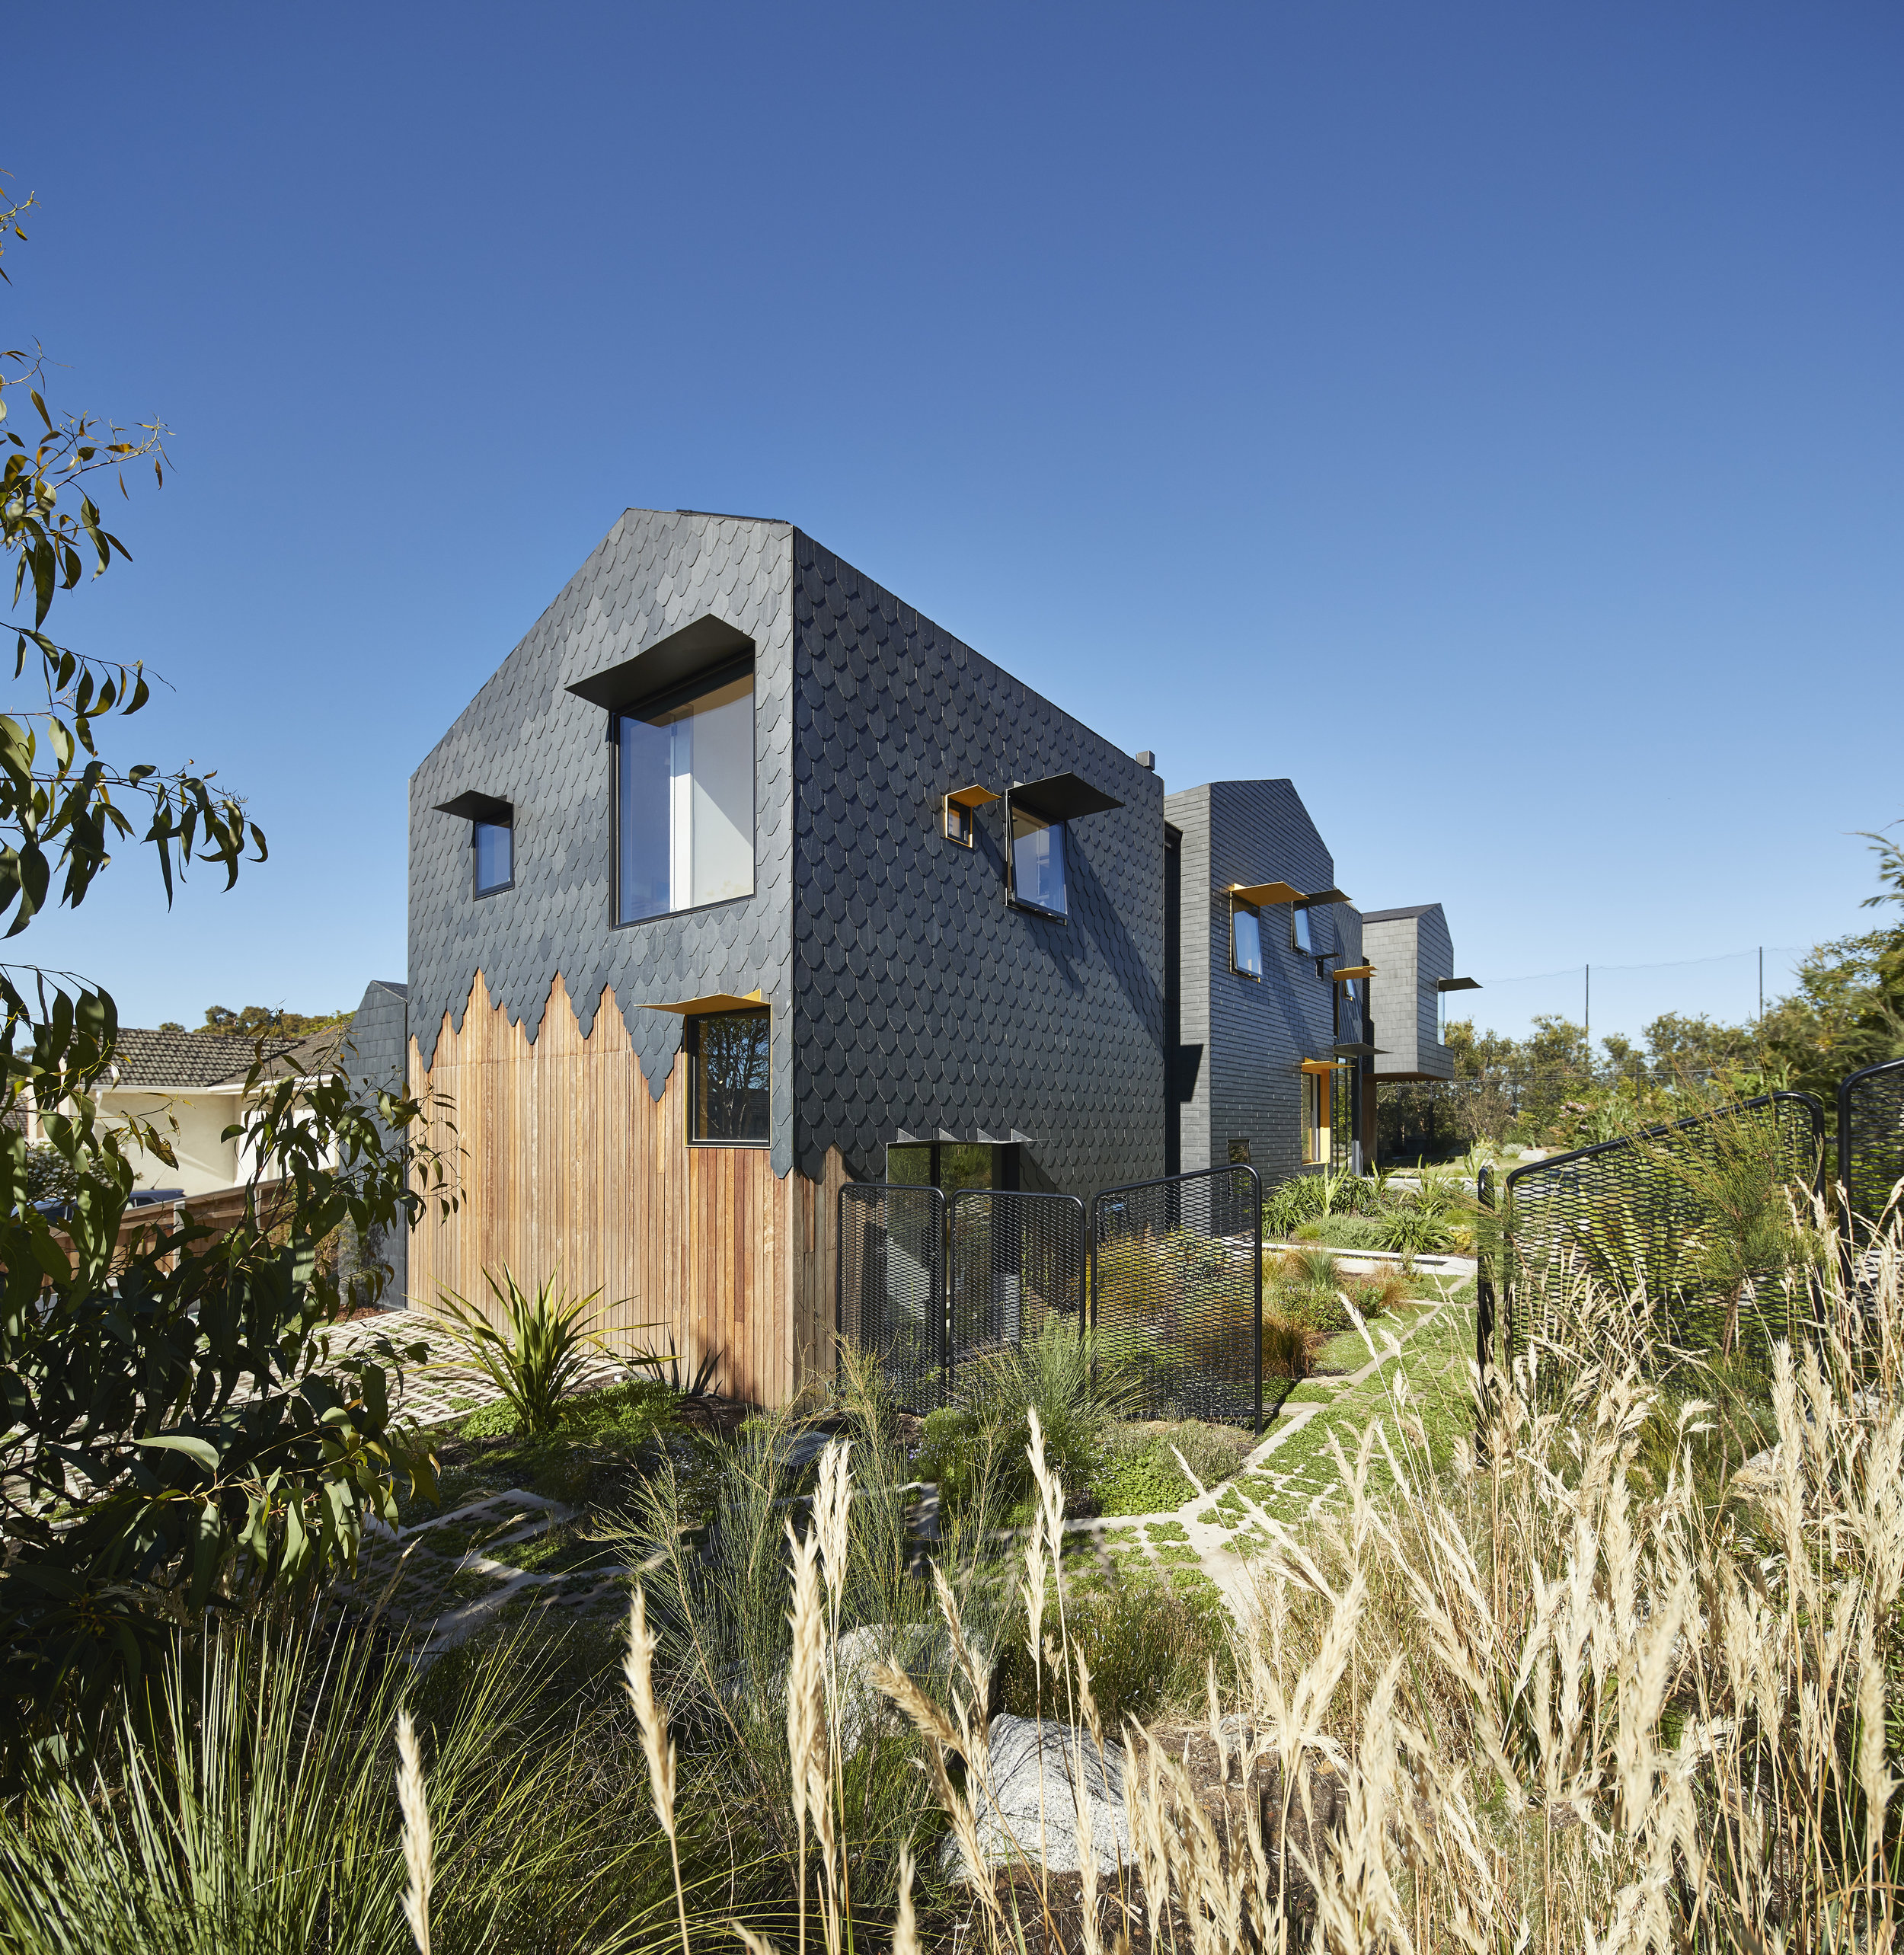 Hill House By Andrew Maynard Architects: Austin Maynard Architects